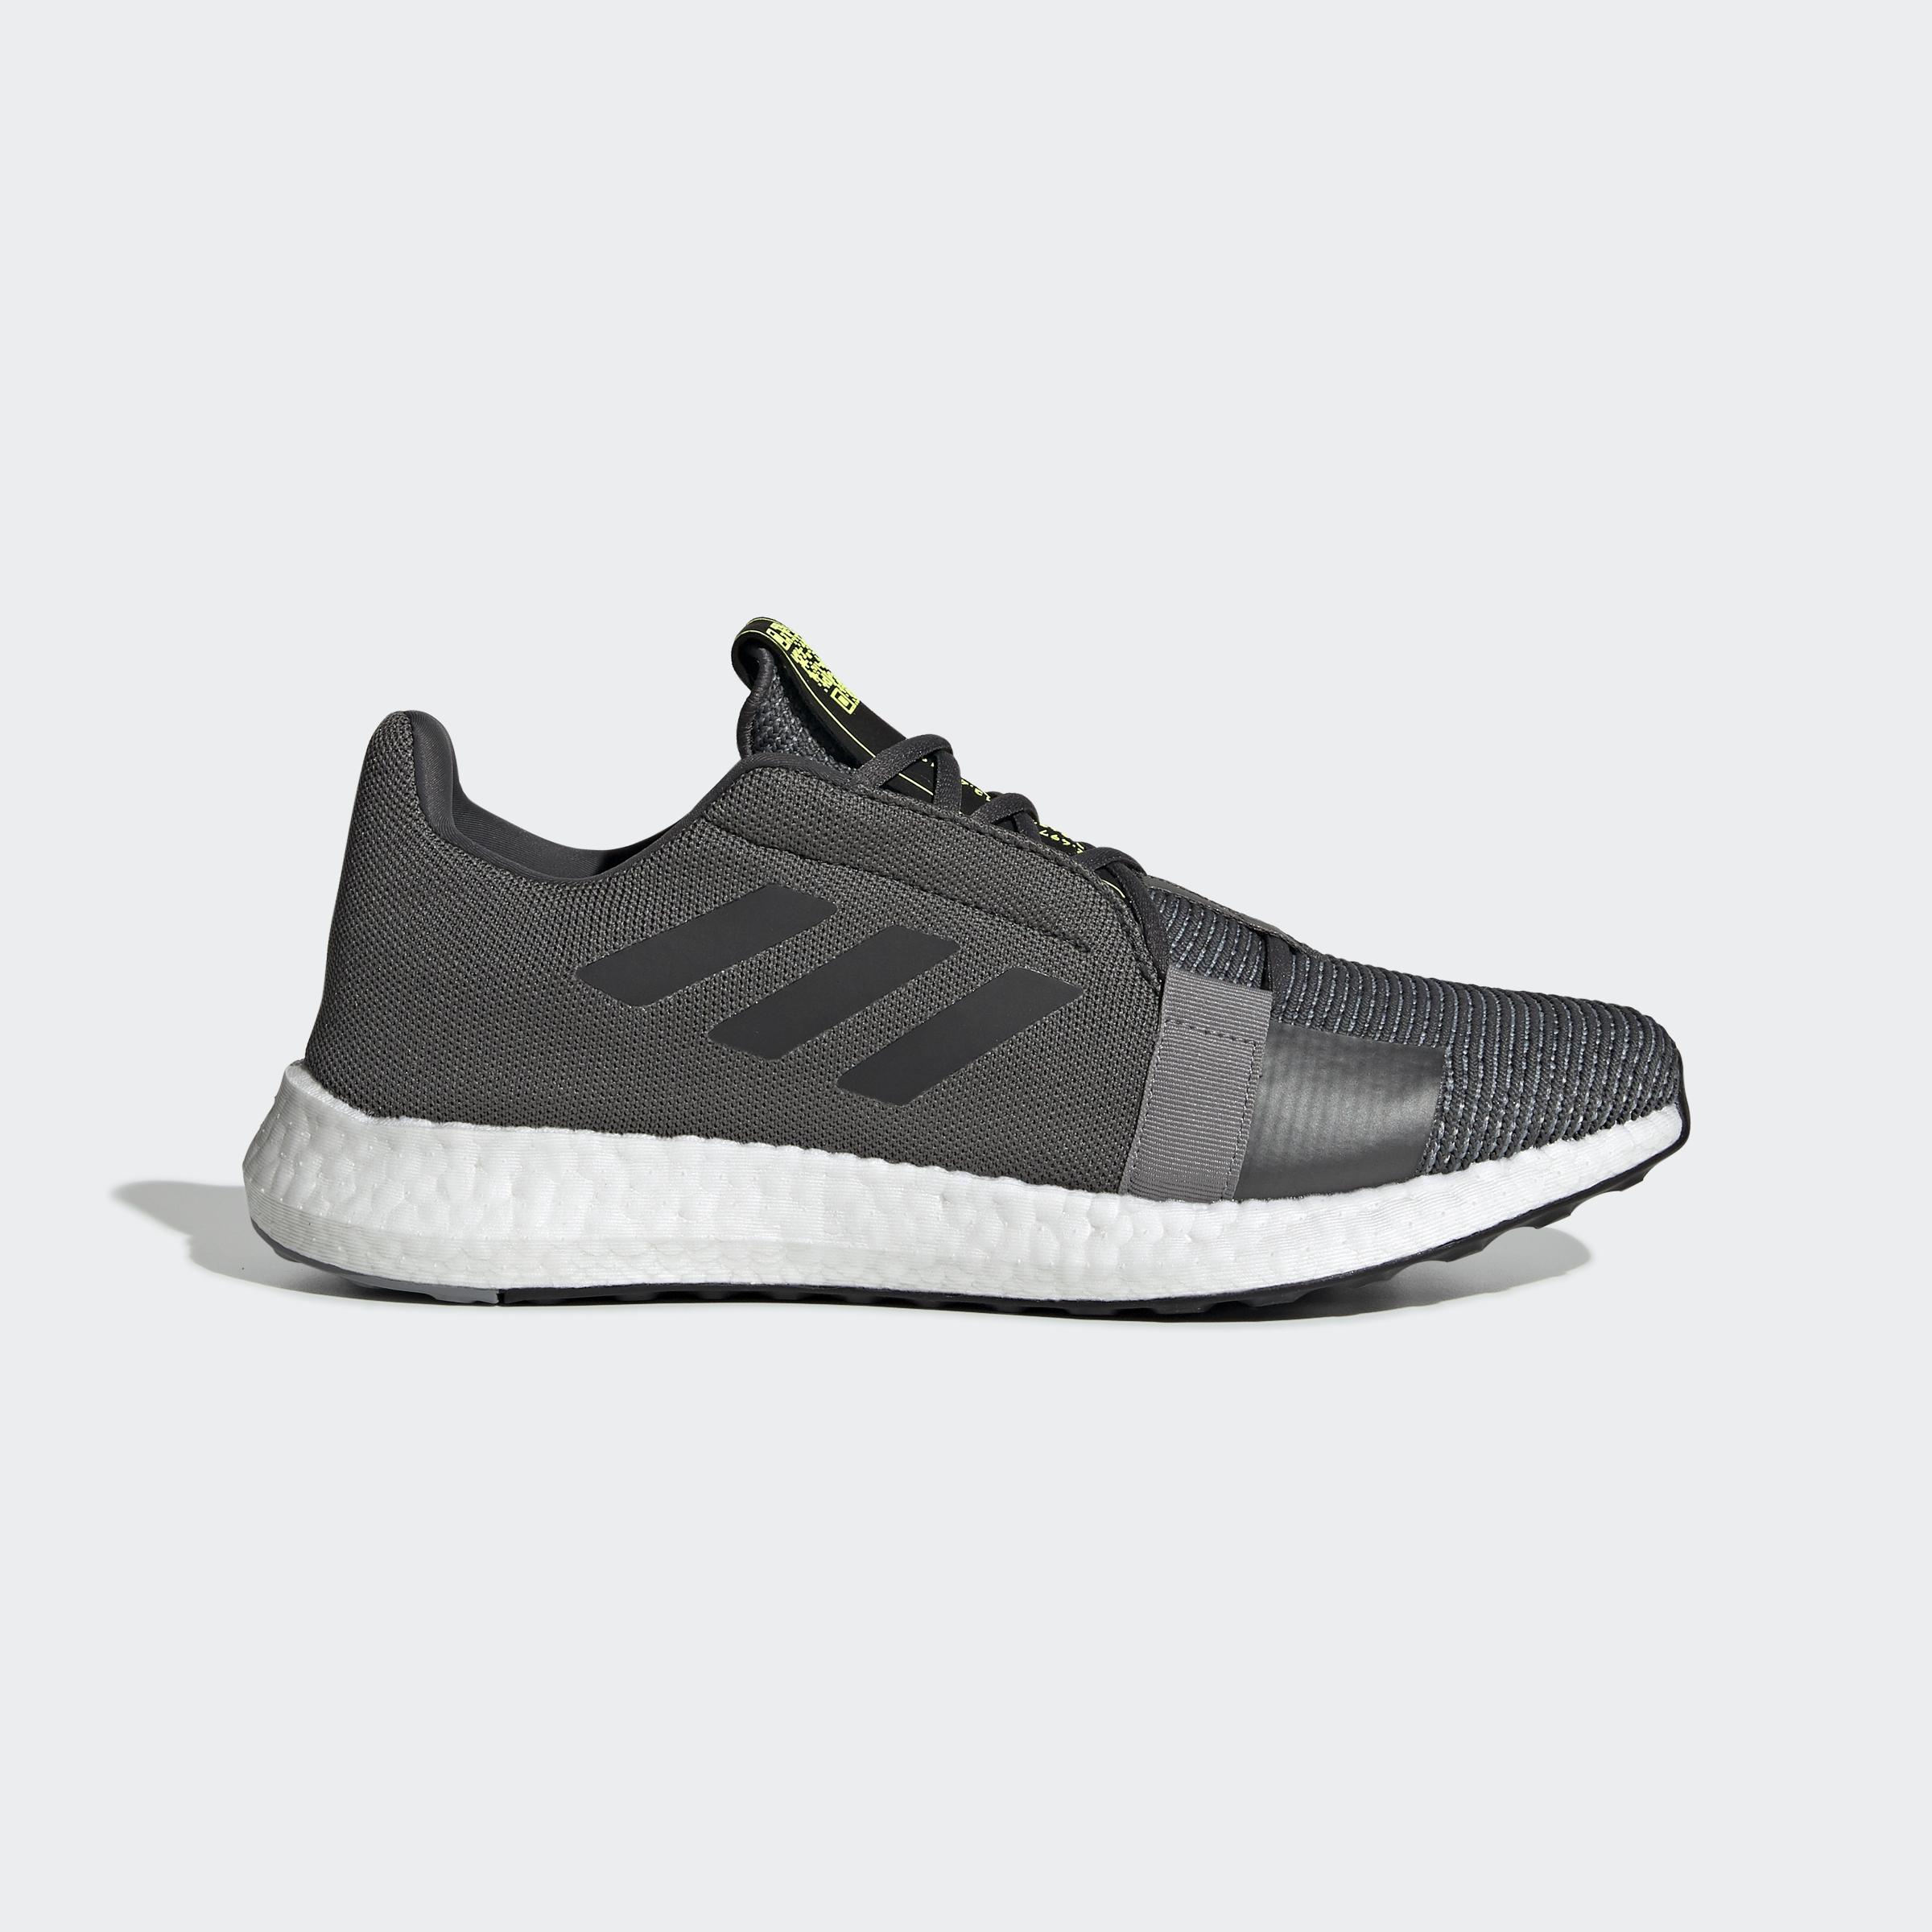 miniature 11 - adidas Senseboost Go Shoes Men's Athletic & Sneakers